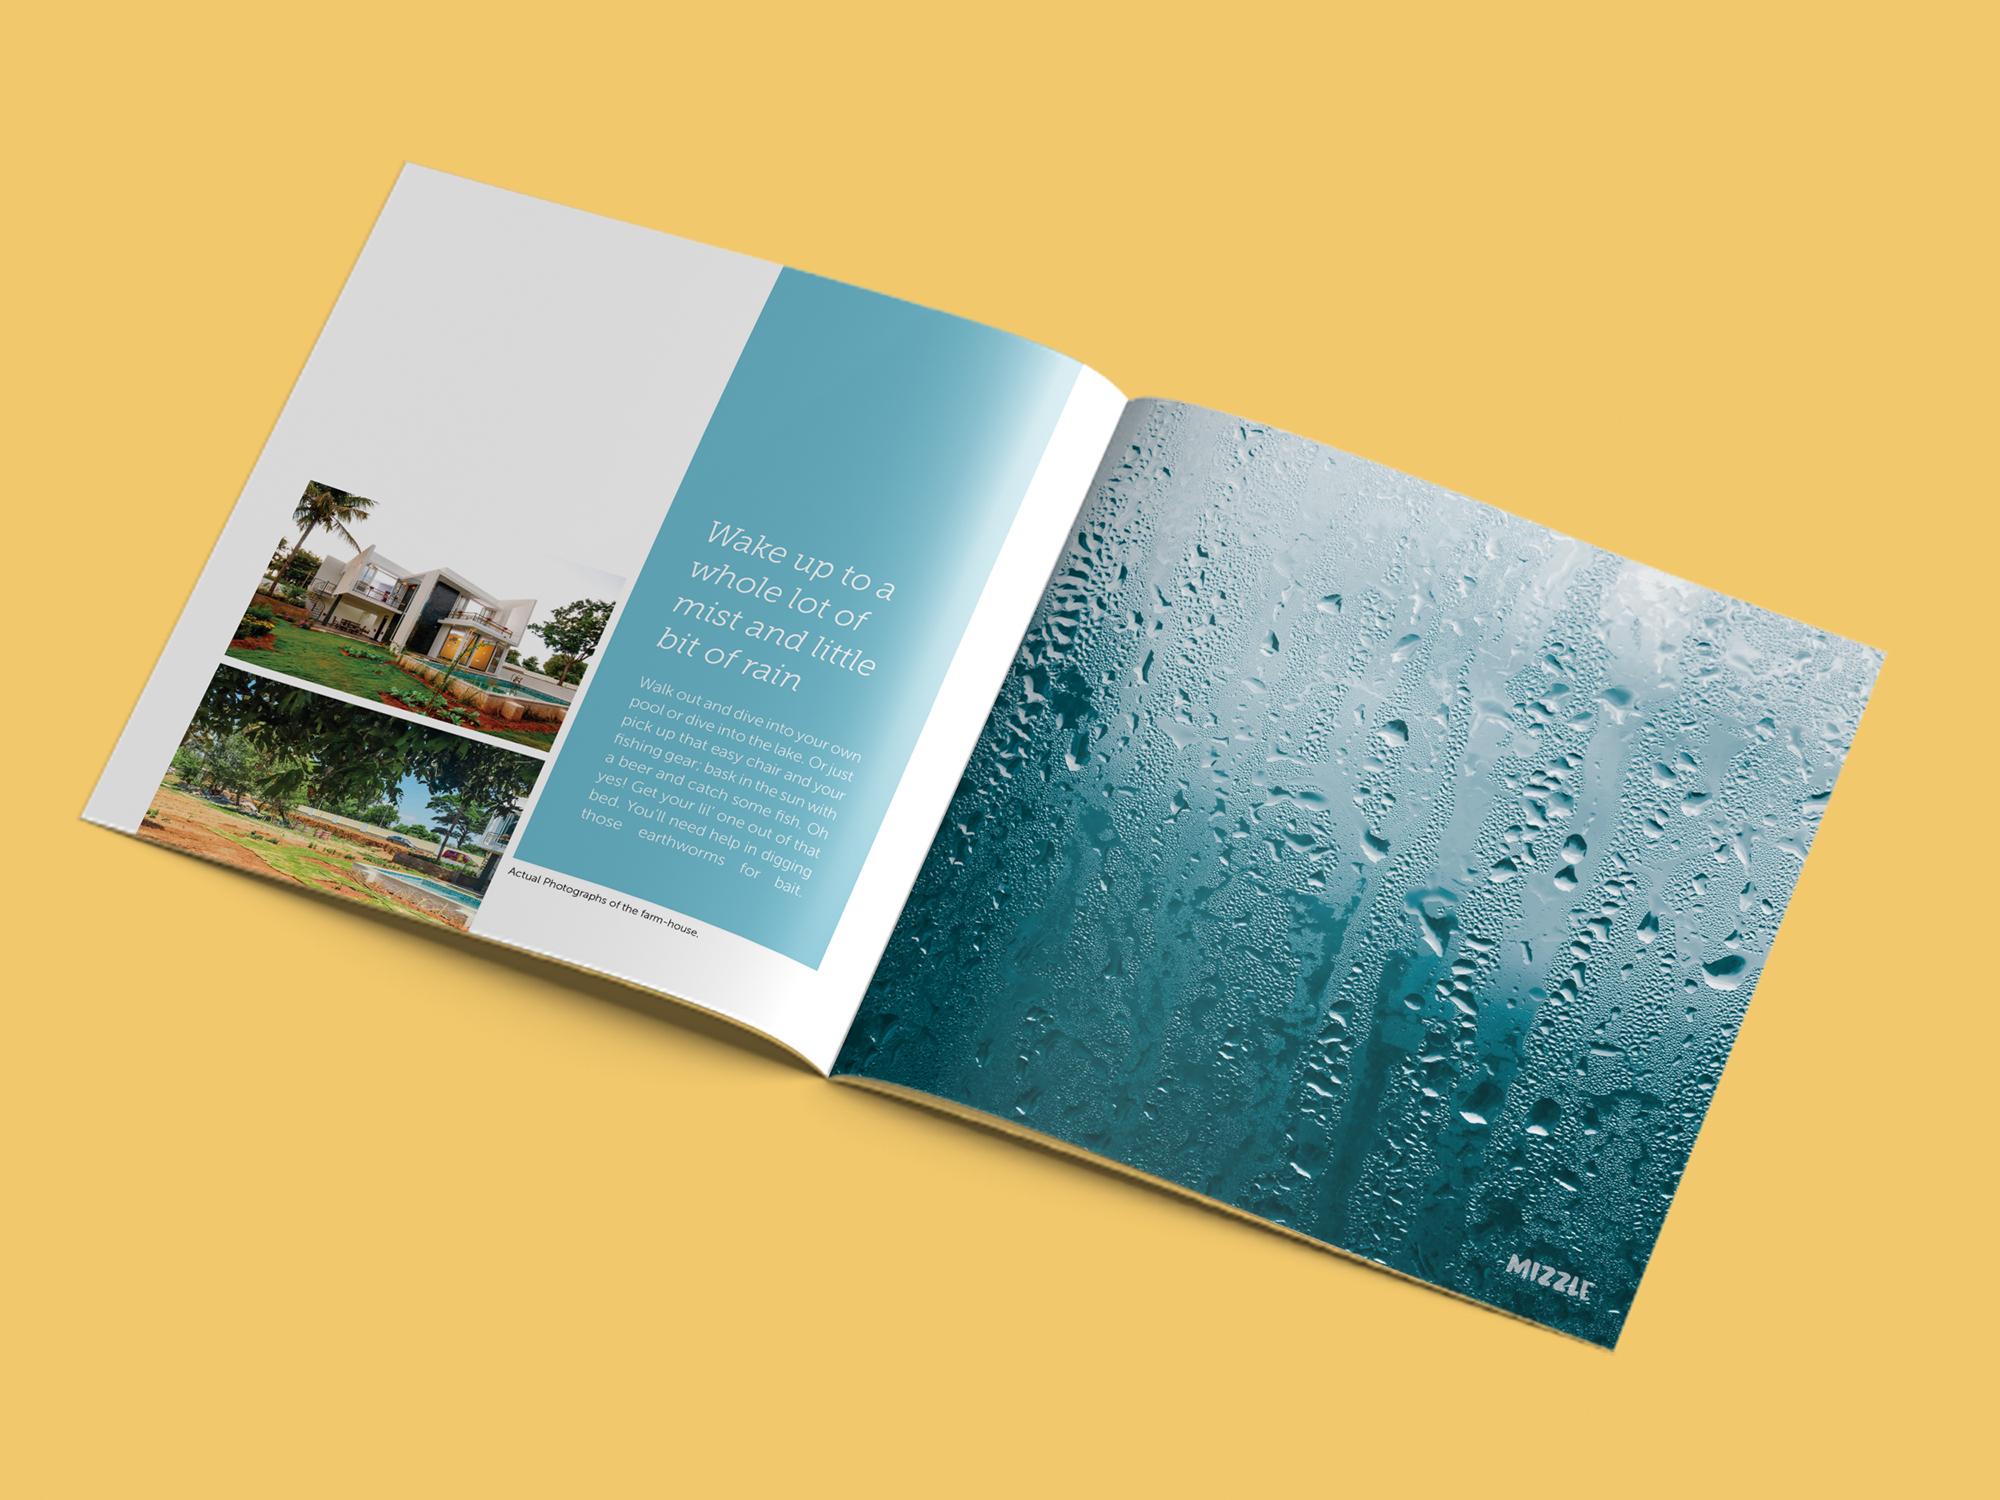 mizzle_brochure_1